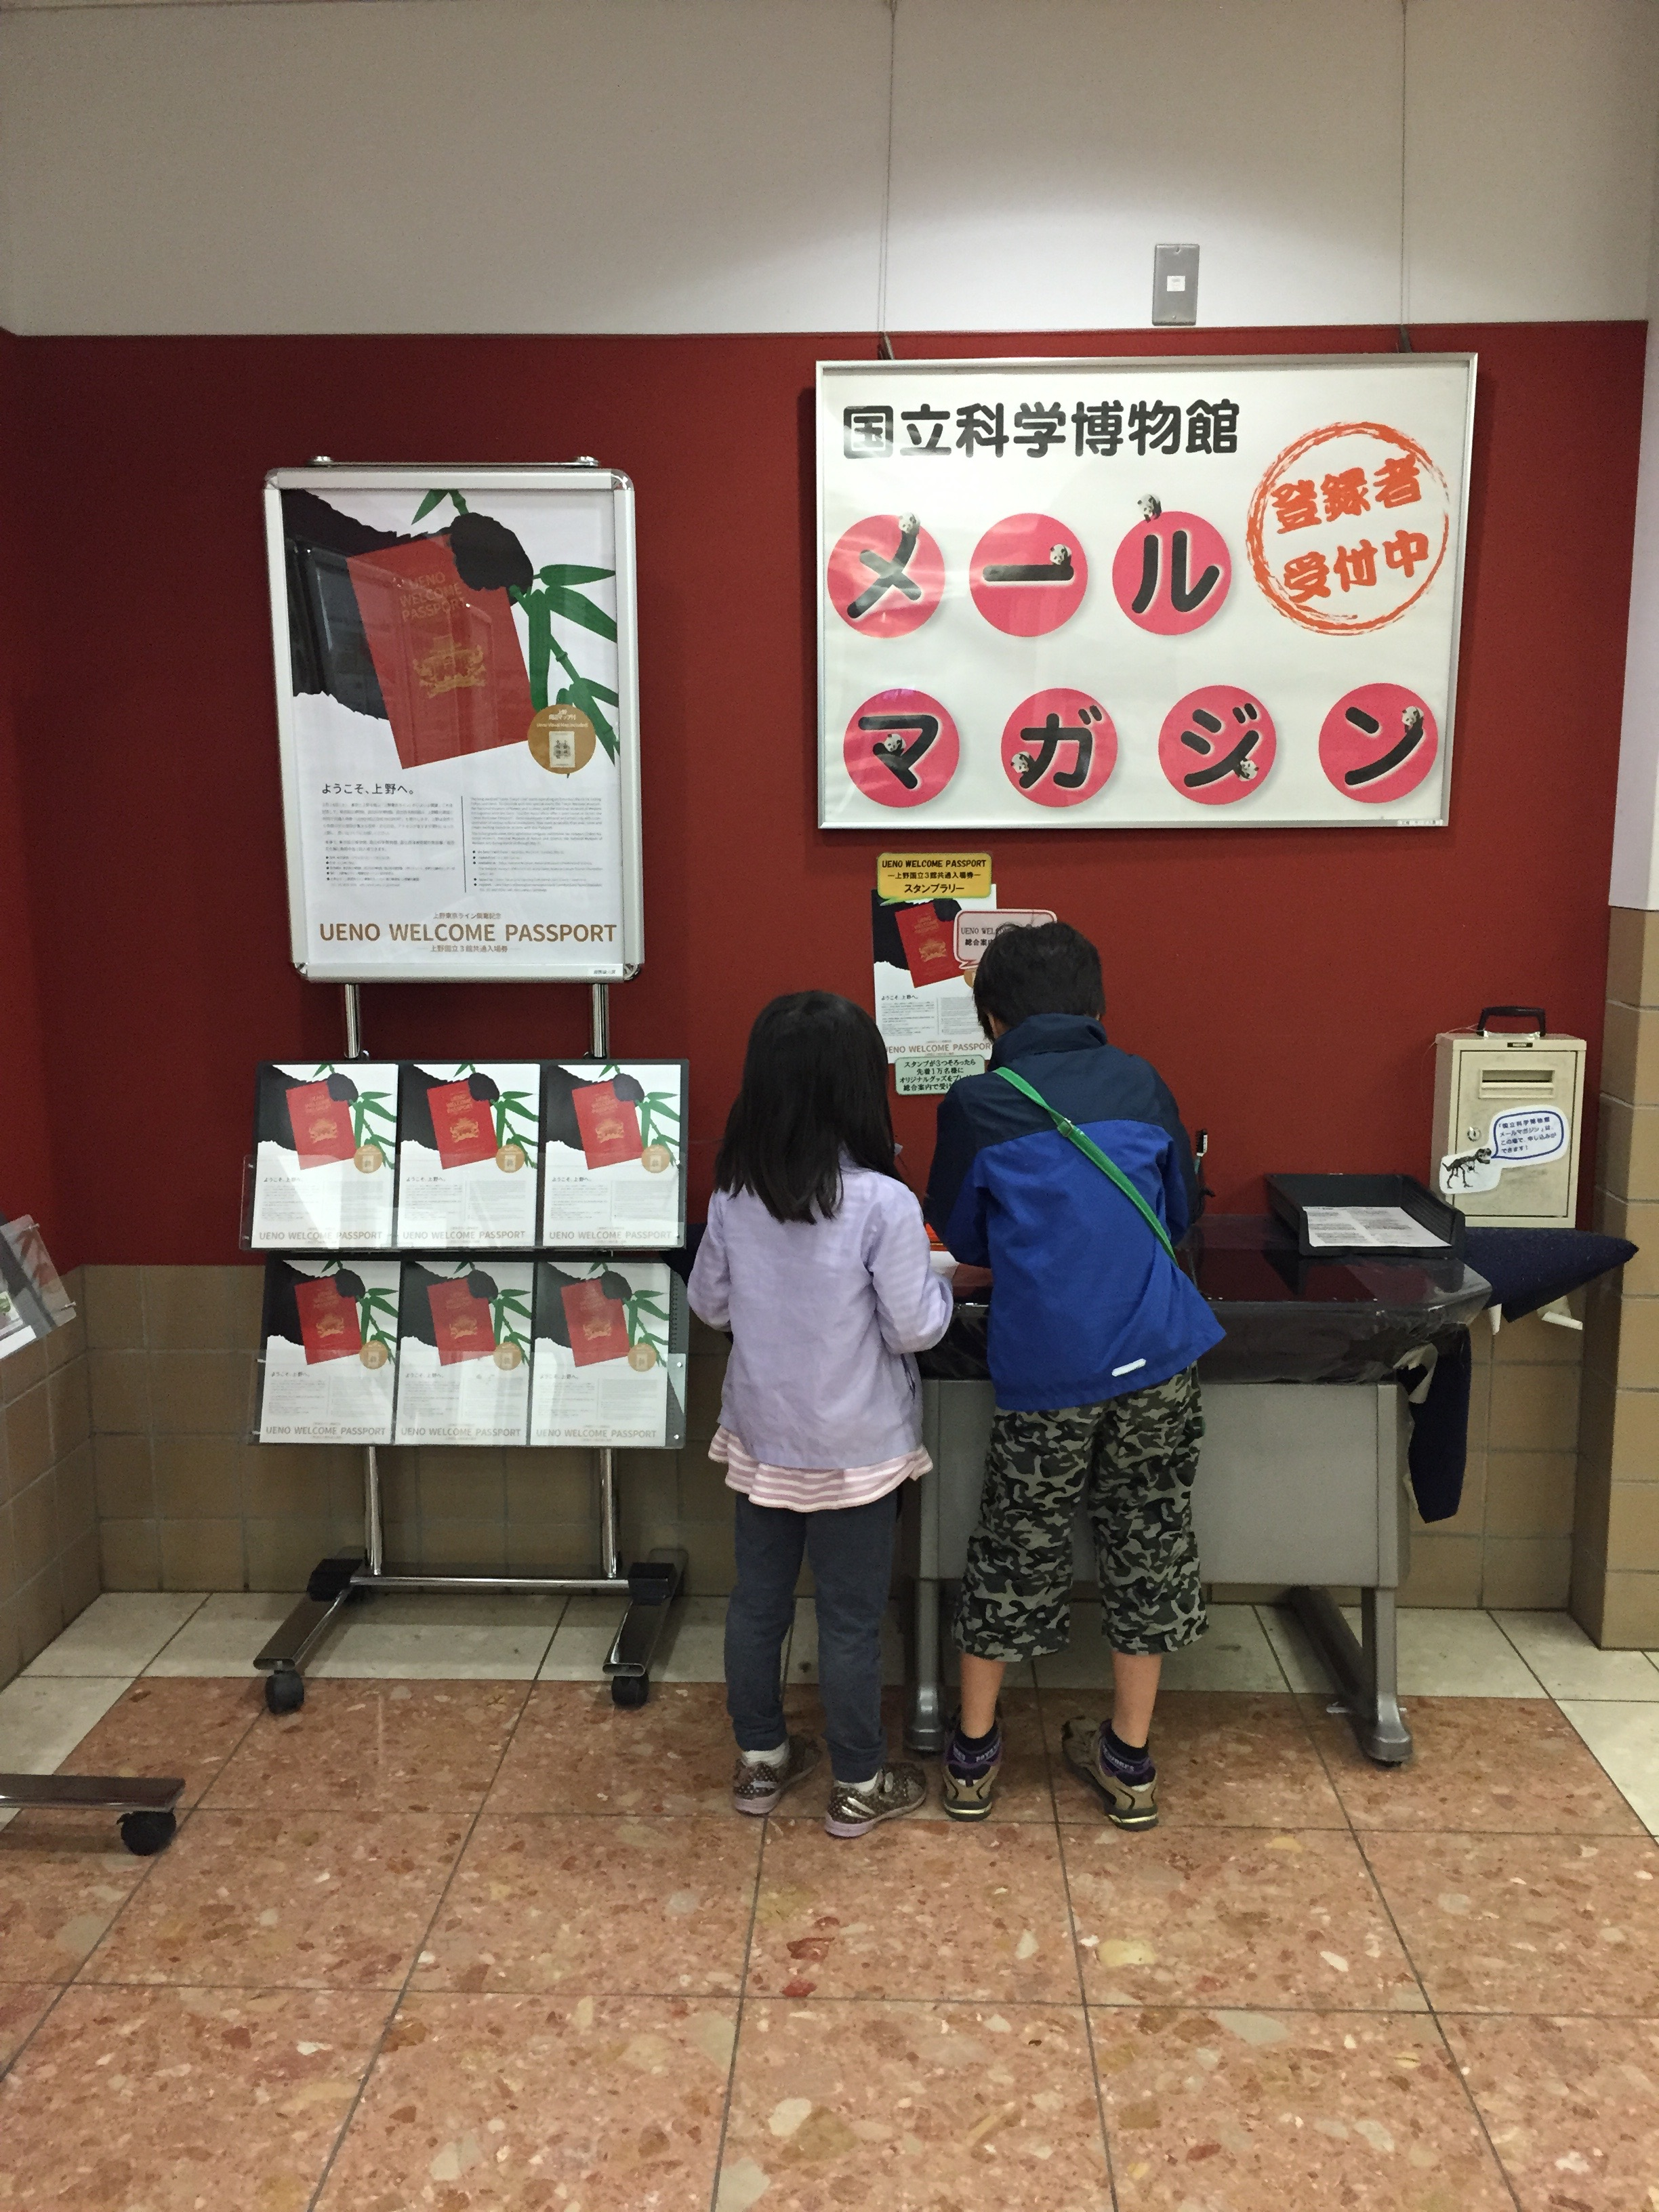 UENO WELCOME PASSPORT2015 ポスター/チラシ